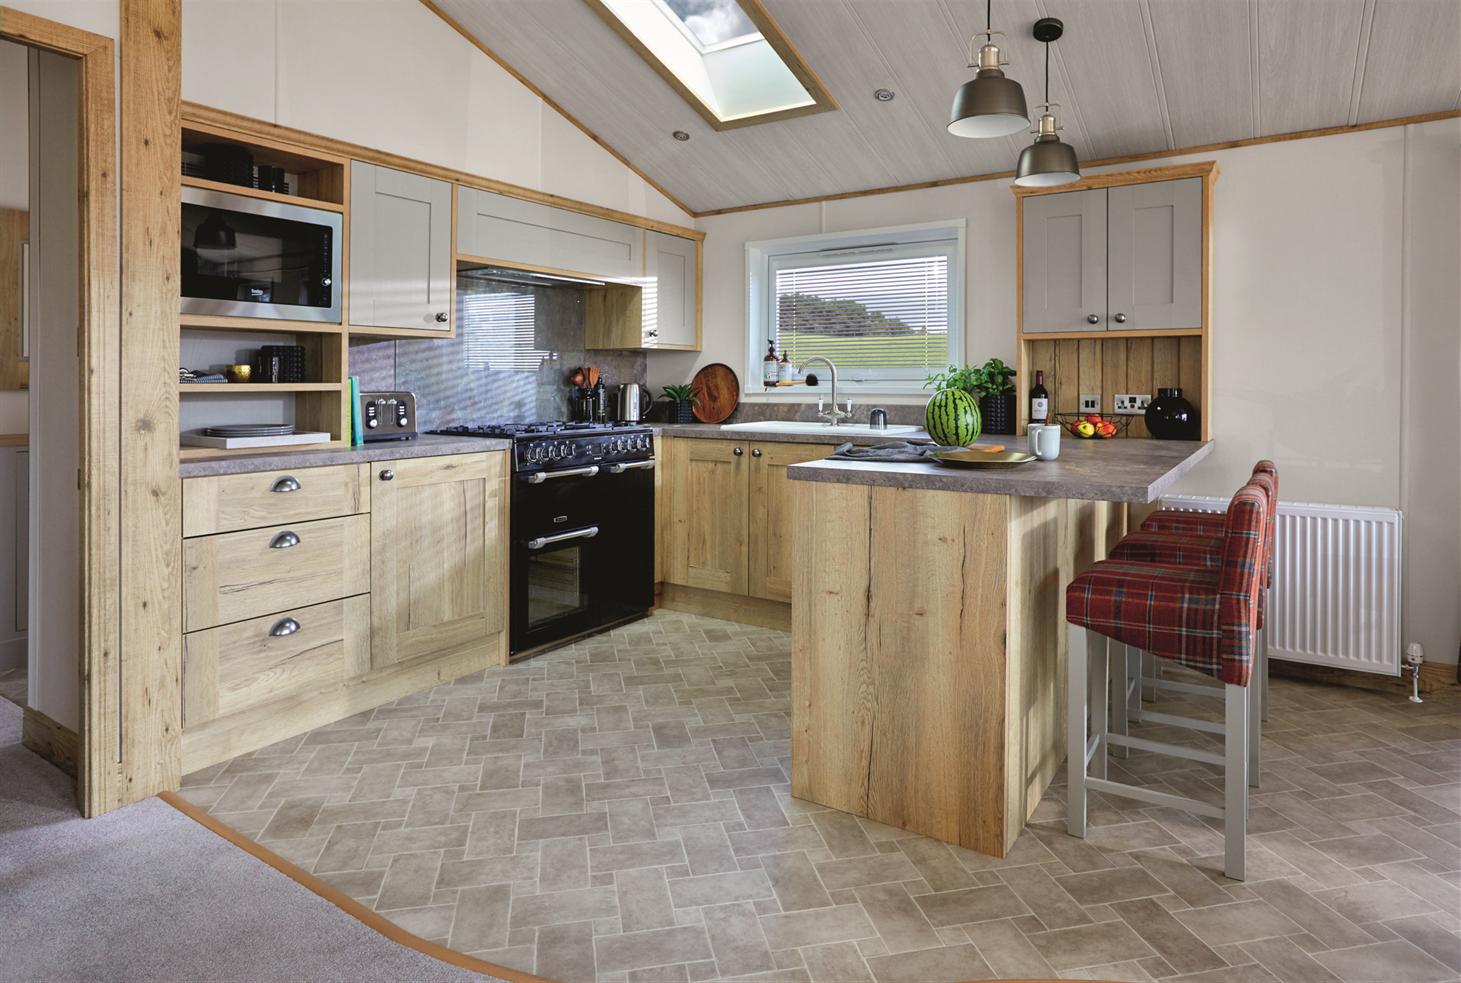 New 2021 ABI Harrogate Lodge 41ft x 20ft - 2 - kitchen view